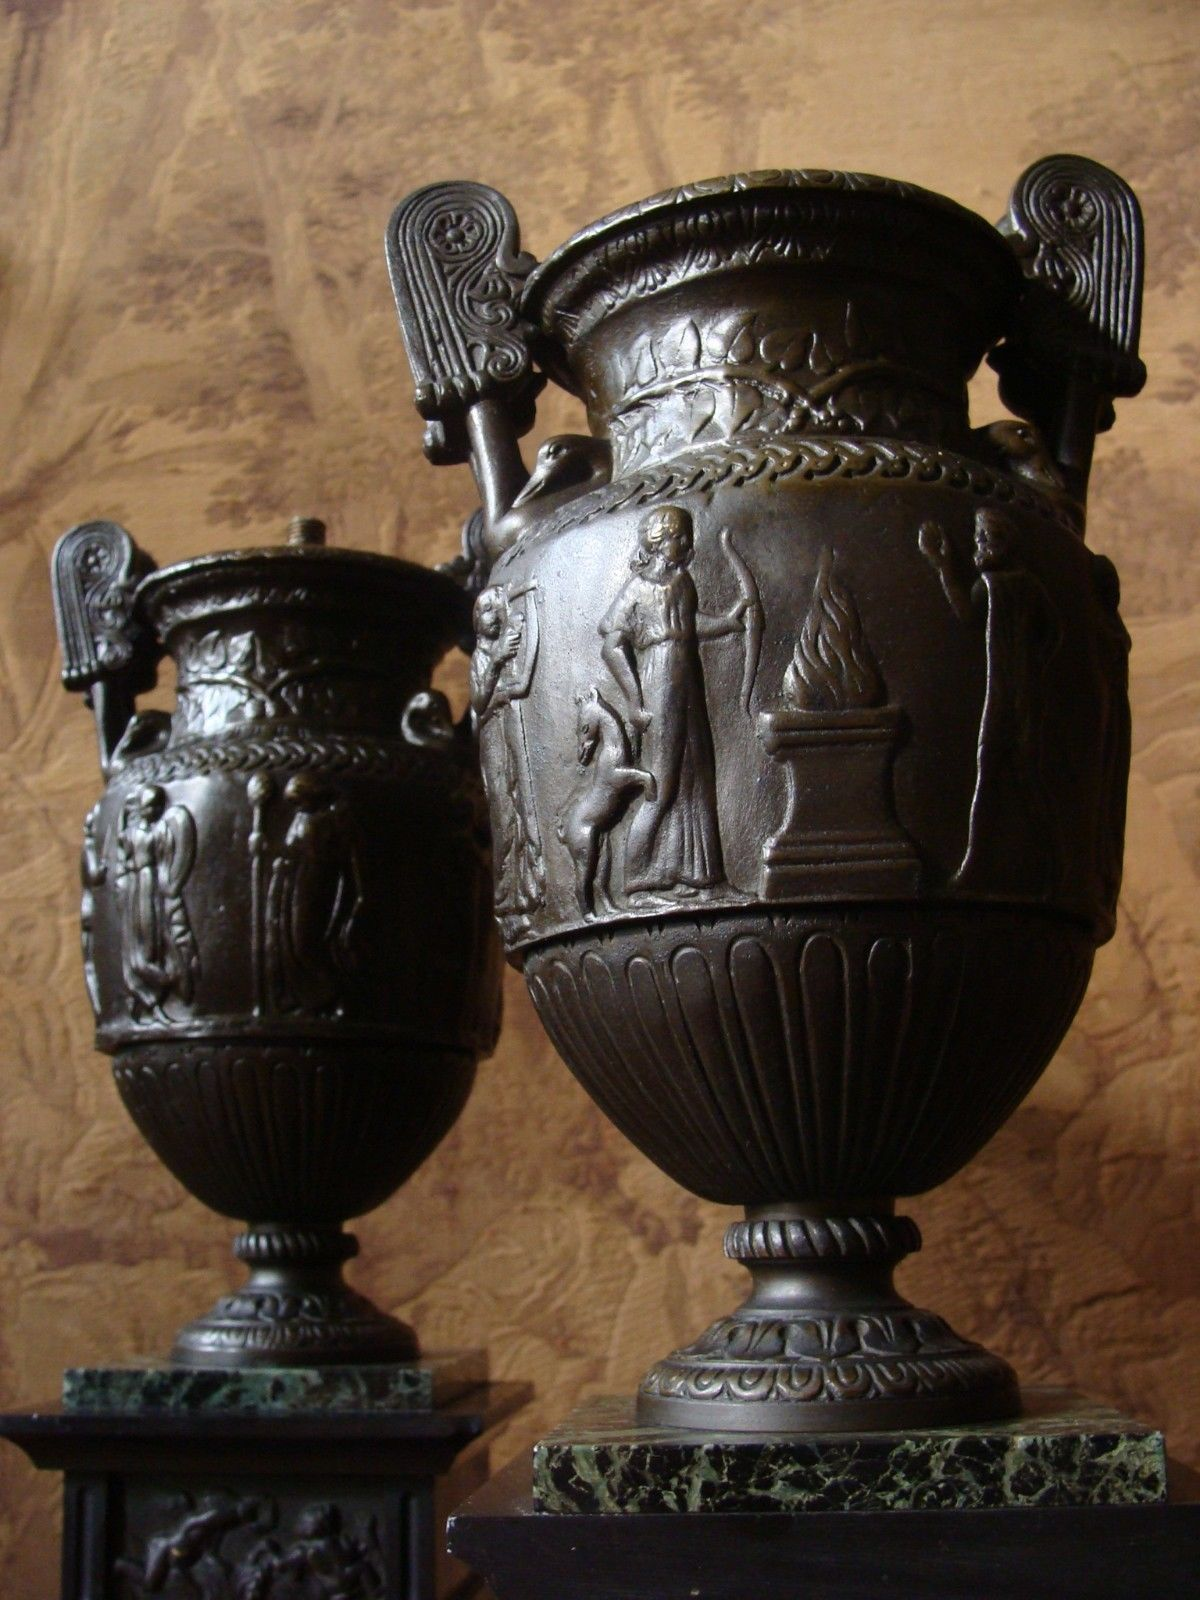 2 Krater Vasen Urne Bronze Klassizismus Lampen Beisteller Relief Etrusker Romer Antiquitaten Amp Kunst Metallobjekte Bronze E Klassizismus Vase Bronze